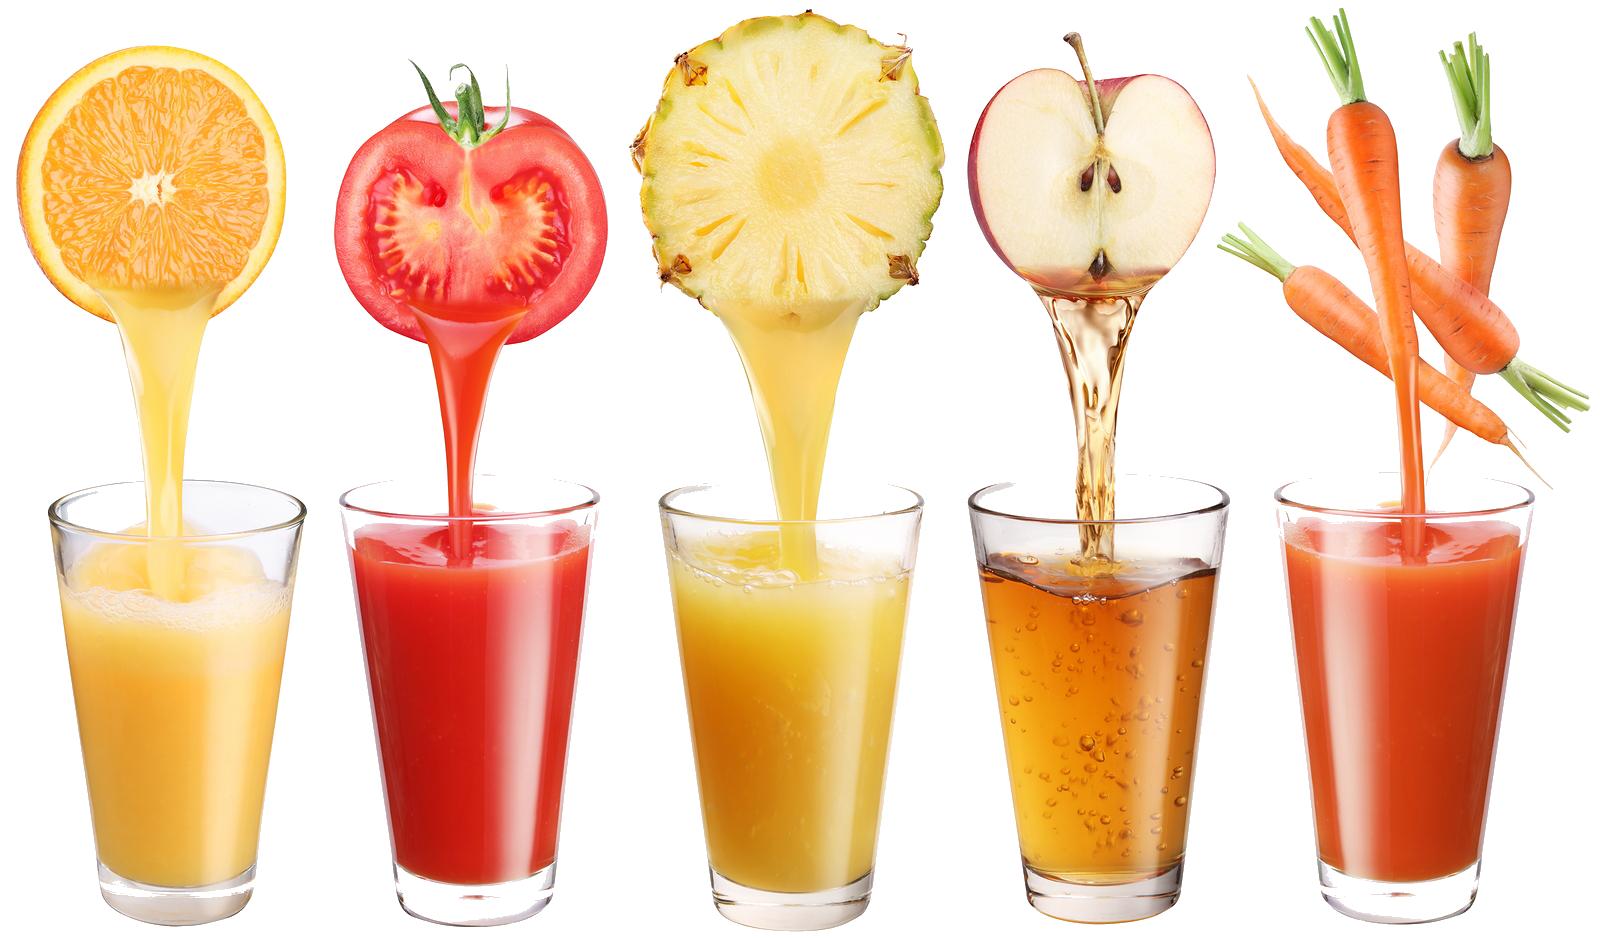 Juice PNG File - Juice PNG